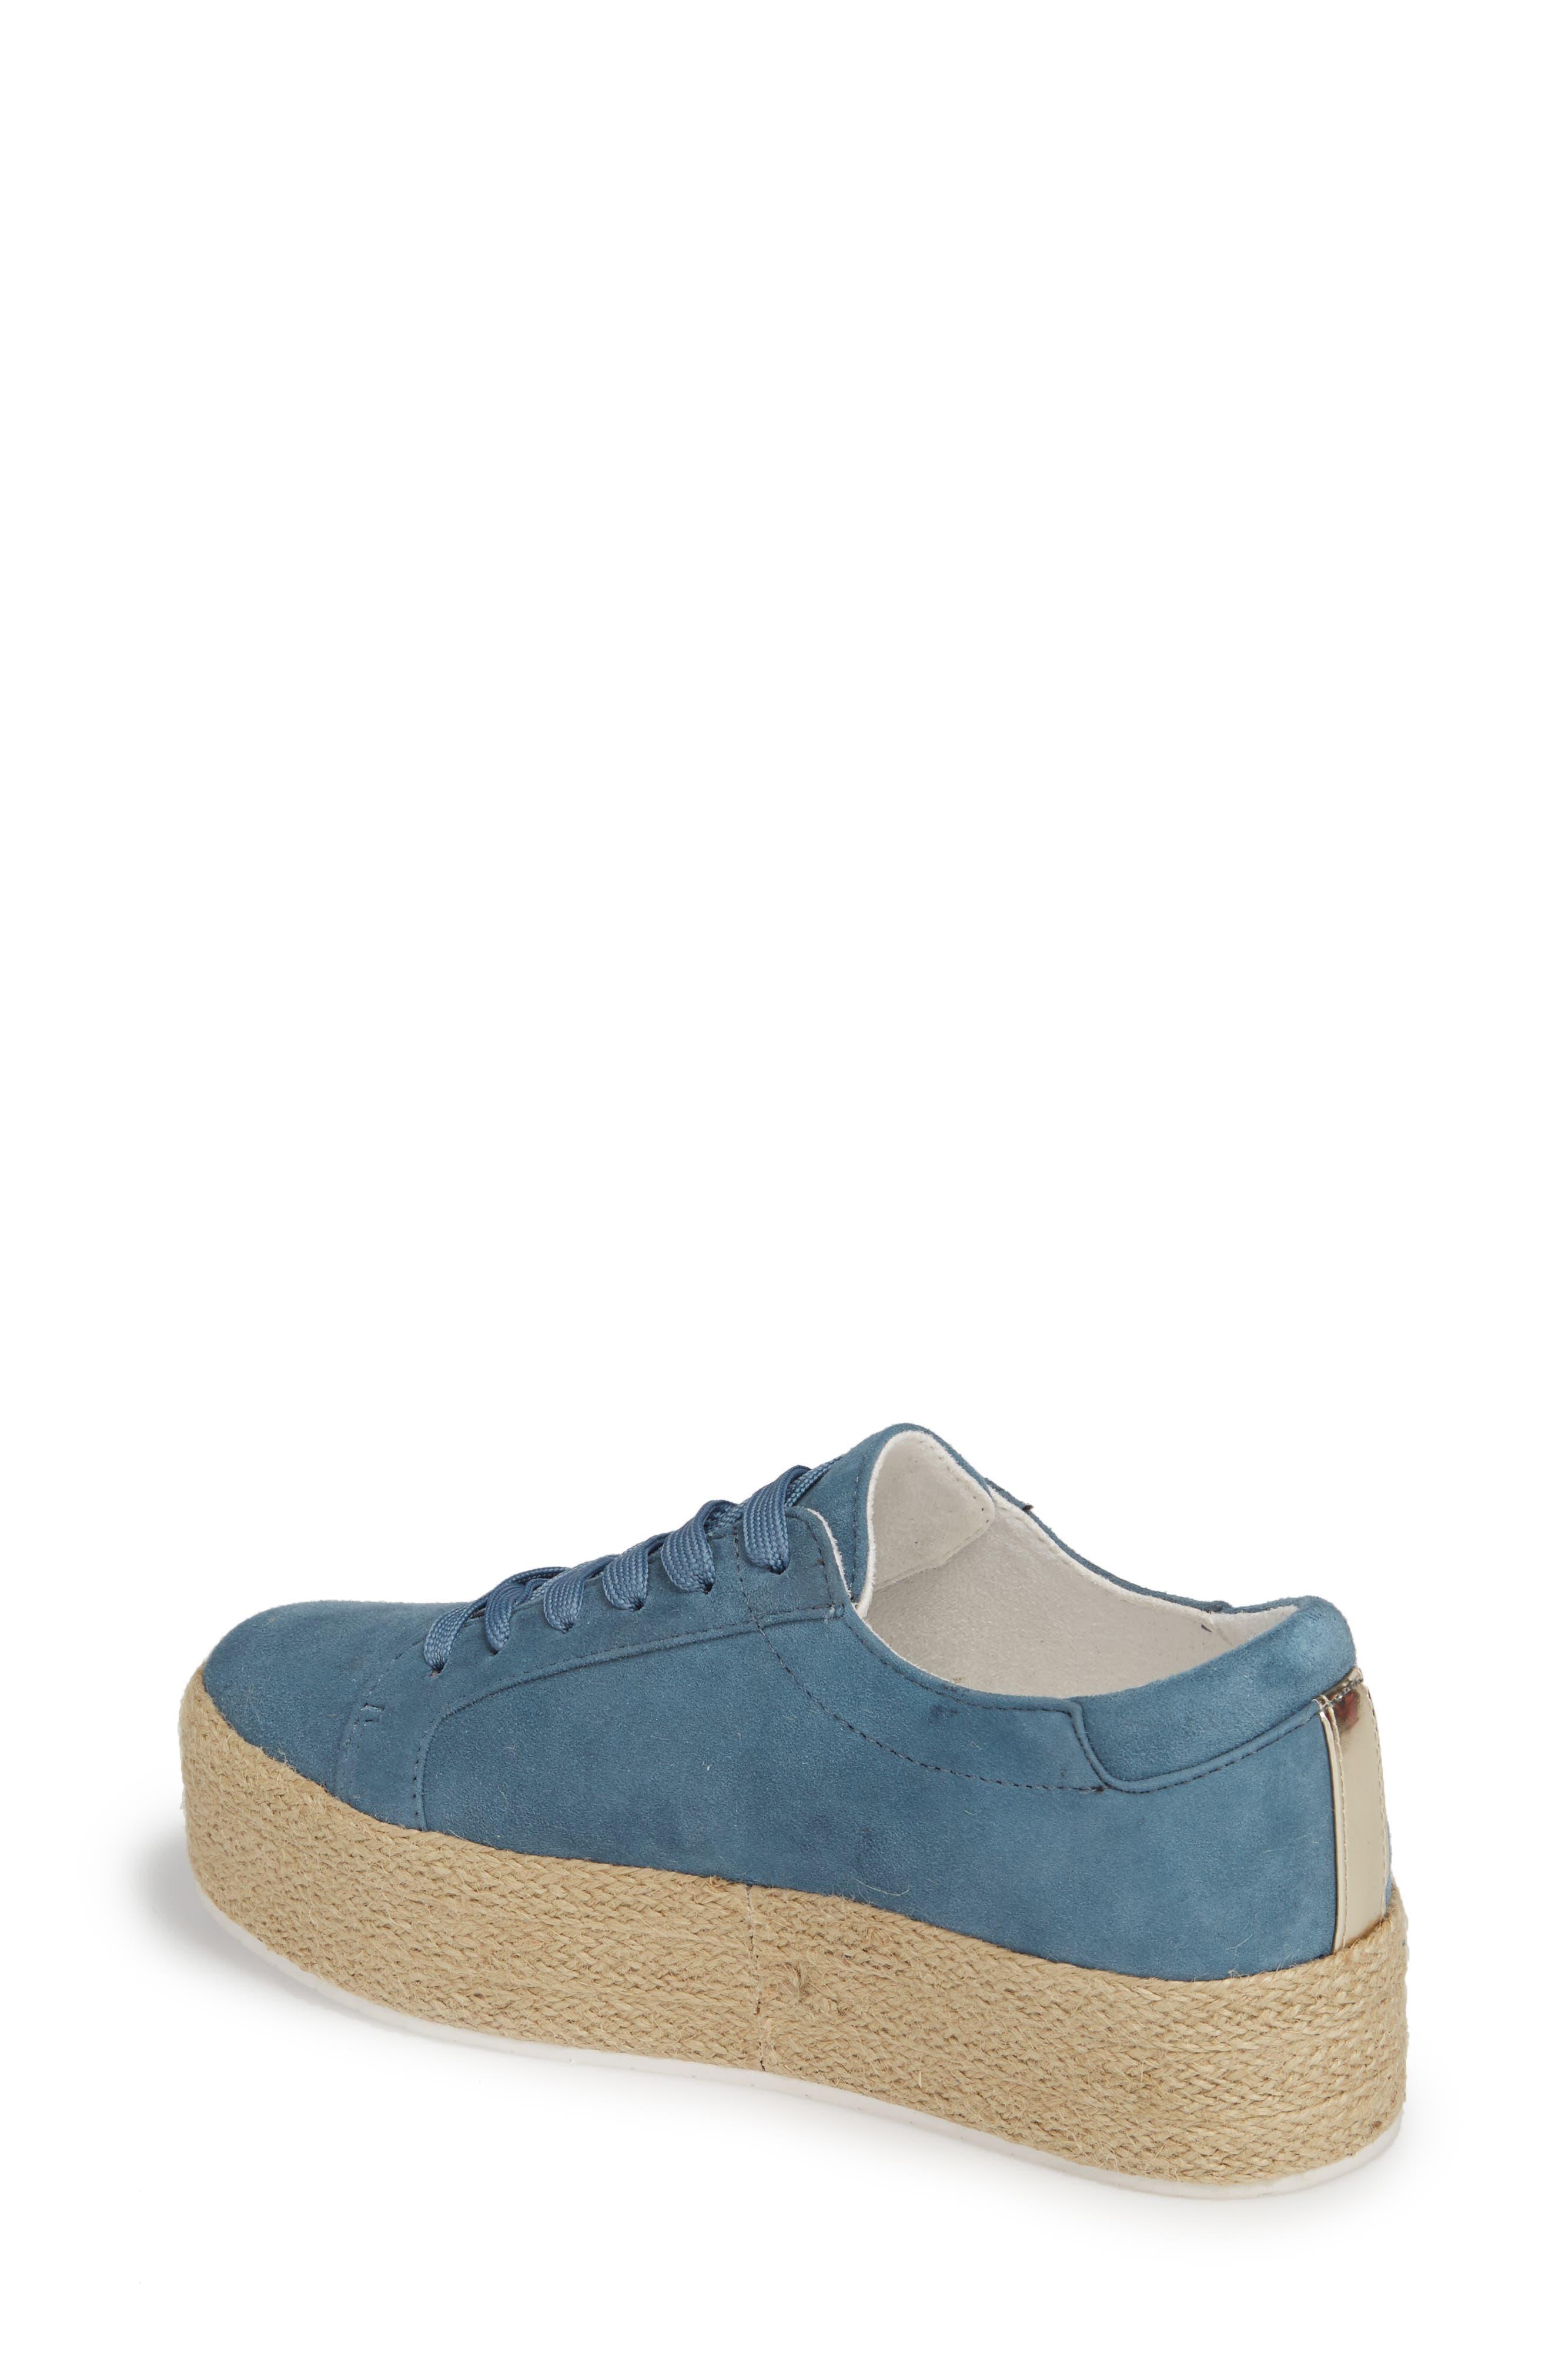 Allyson Espadrille Platform Sneaker,                             Alternate thumbnail 7, color,